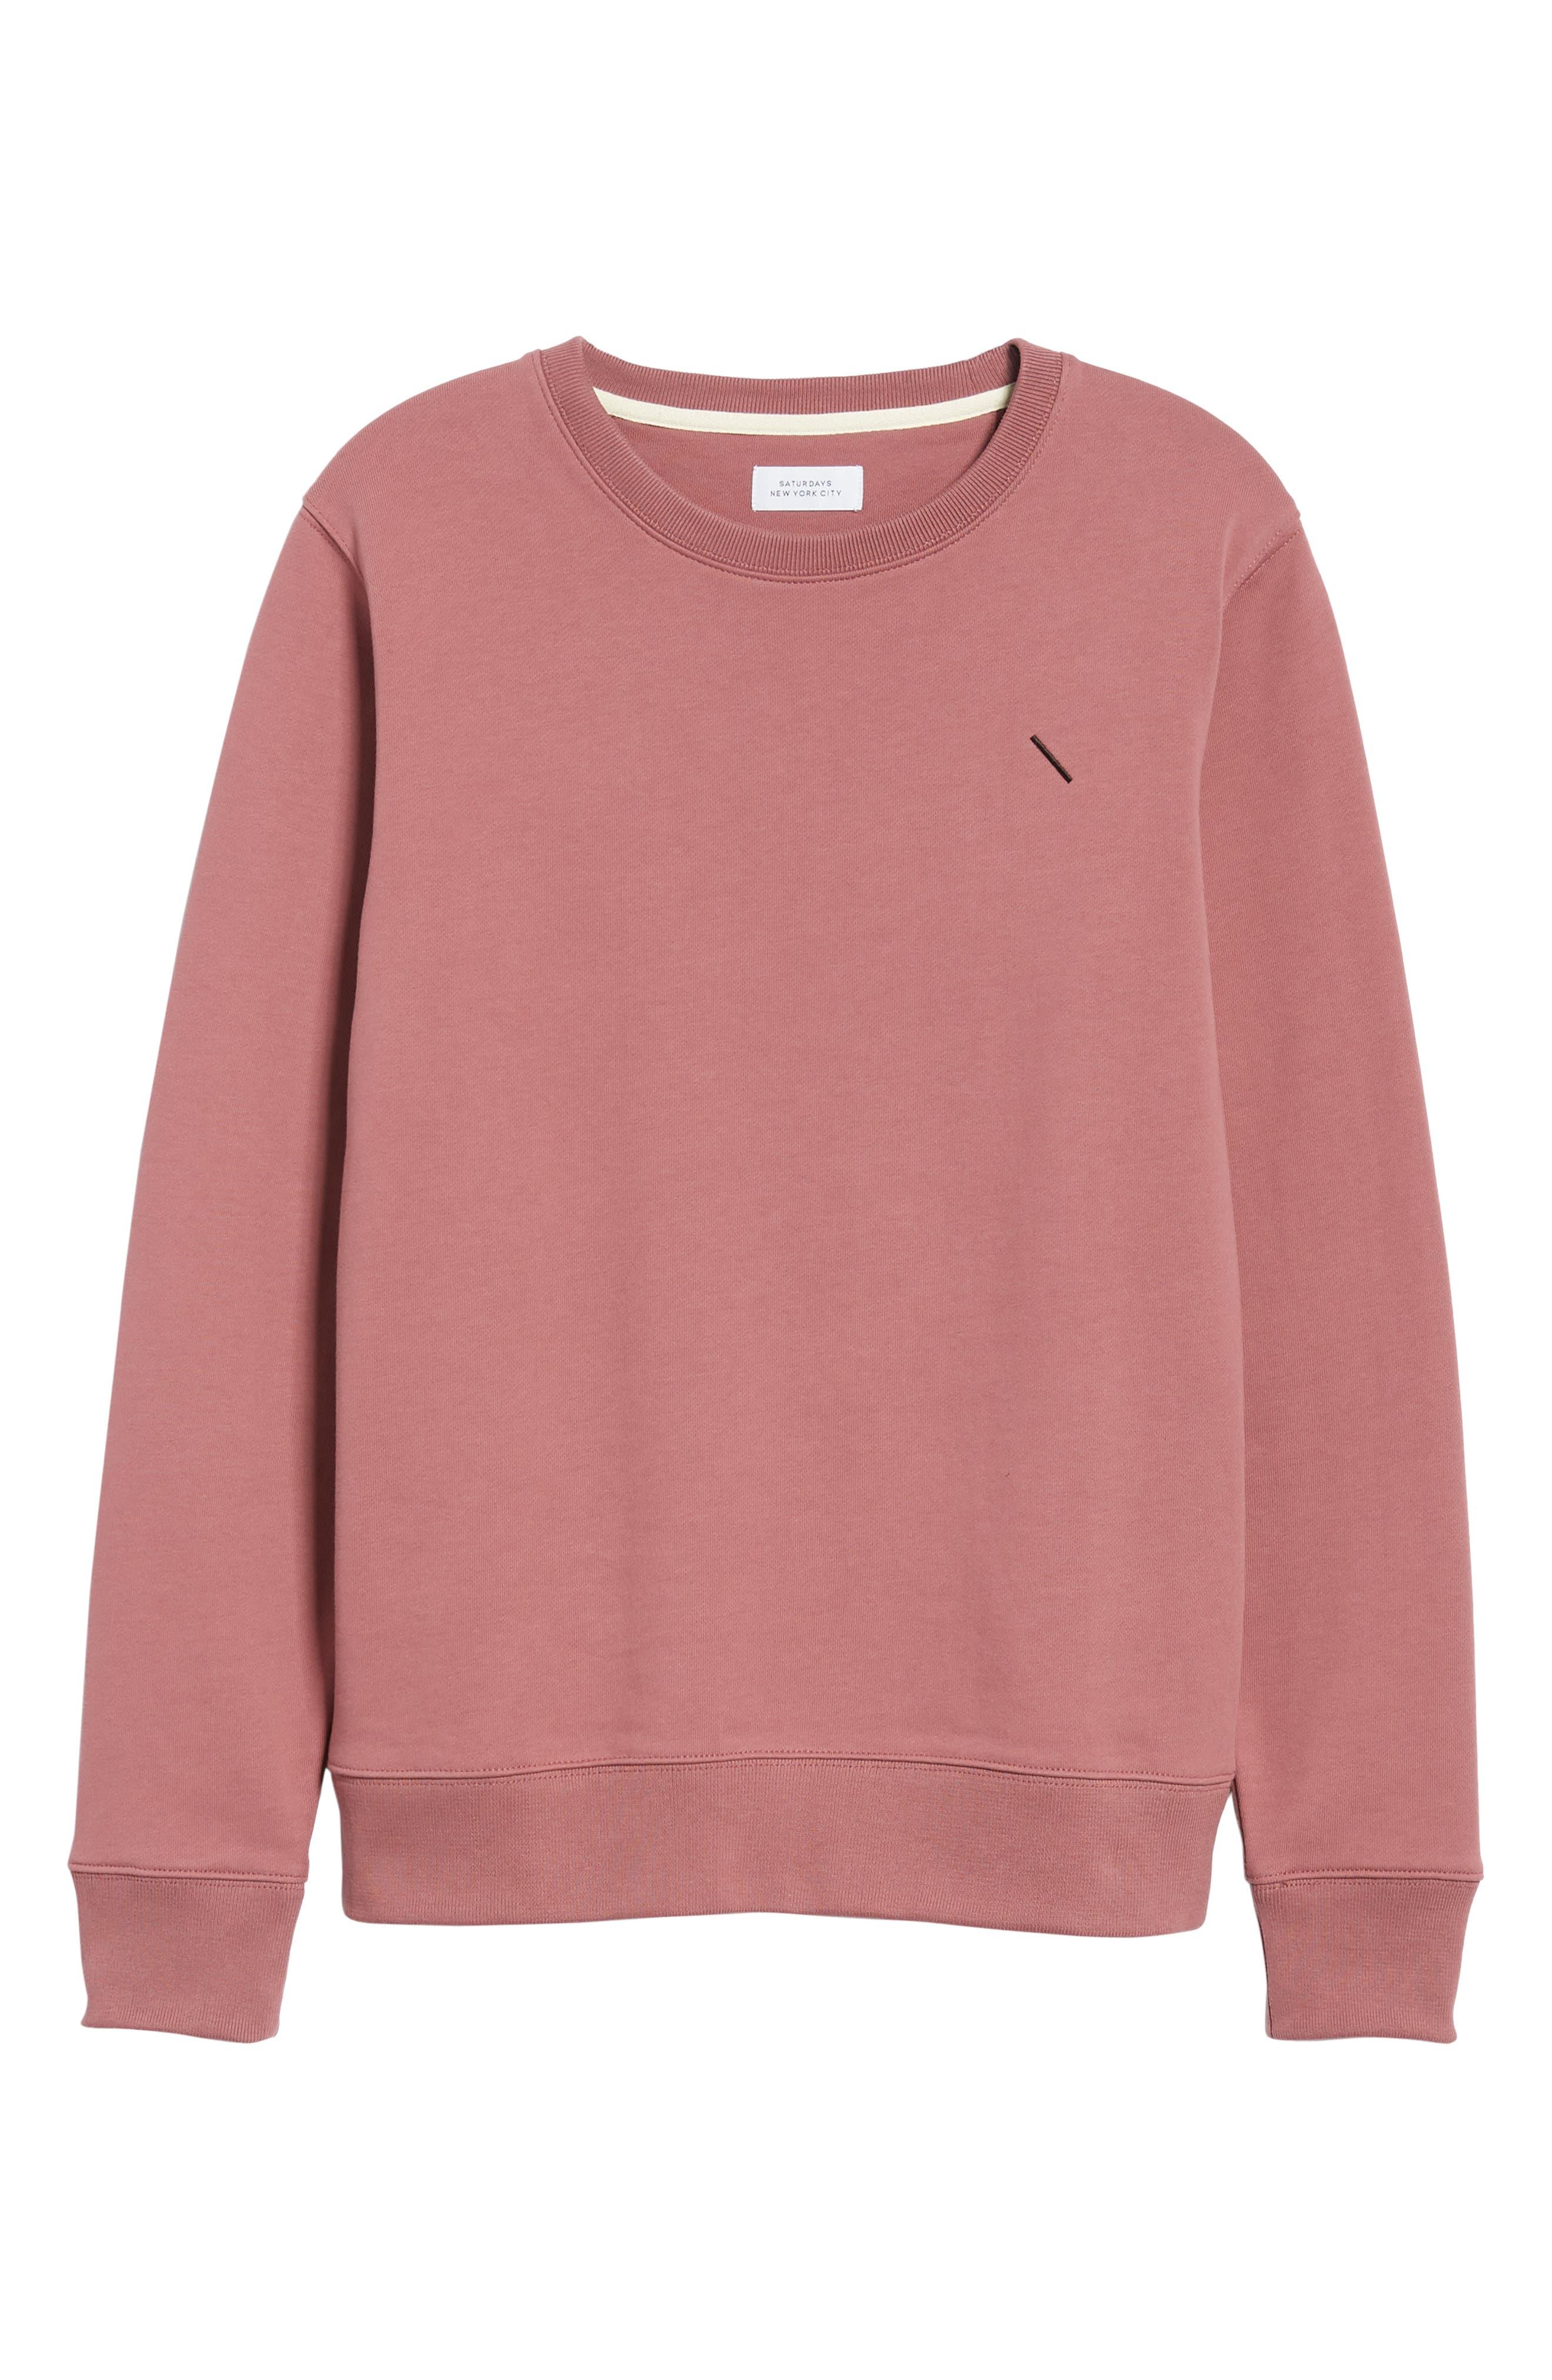 Bowery Sweatshirt,                             Alternate thumbnail 6, color,                             650